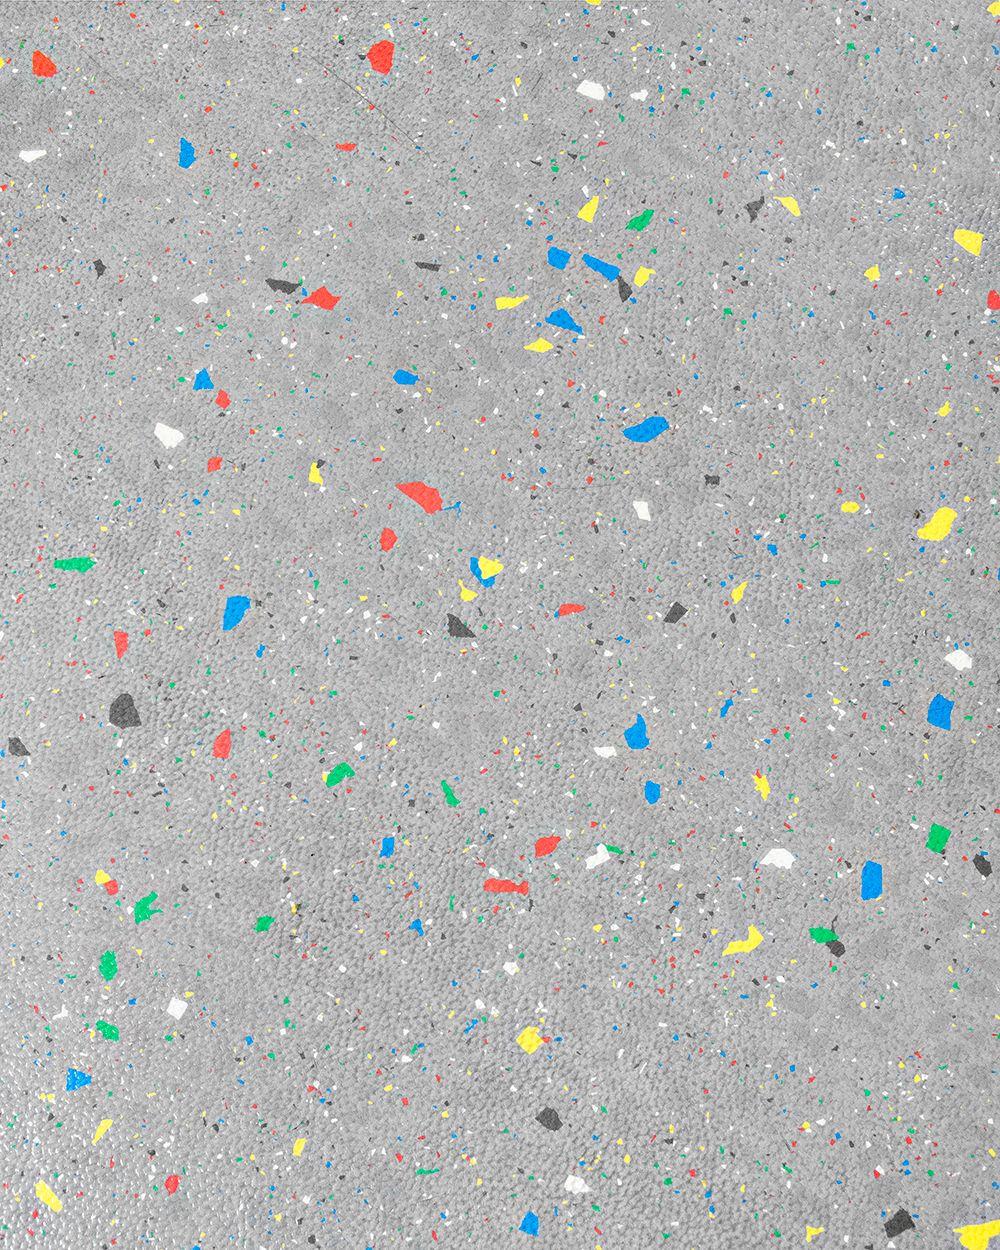 Some Kind Of Speckled Linoleum Or Rubber Flooring Possibly